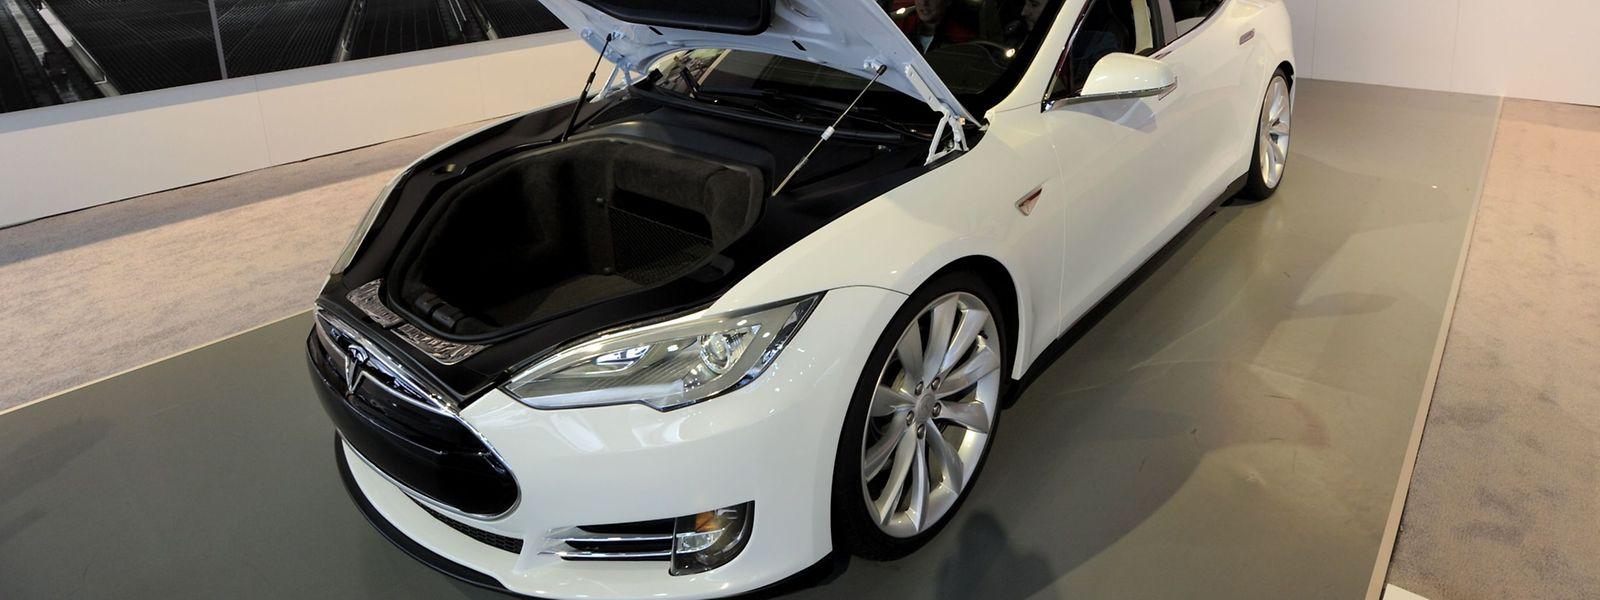 Das Tesla Model S.